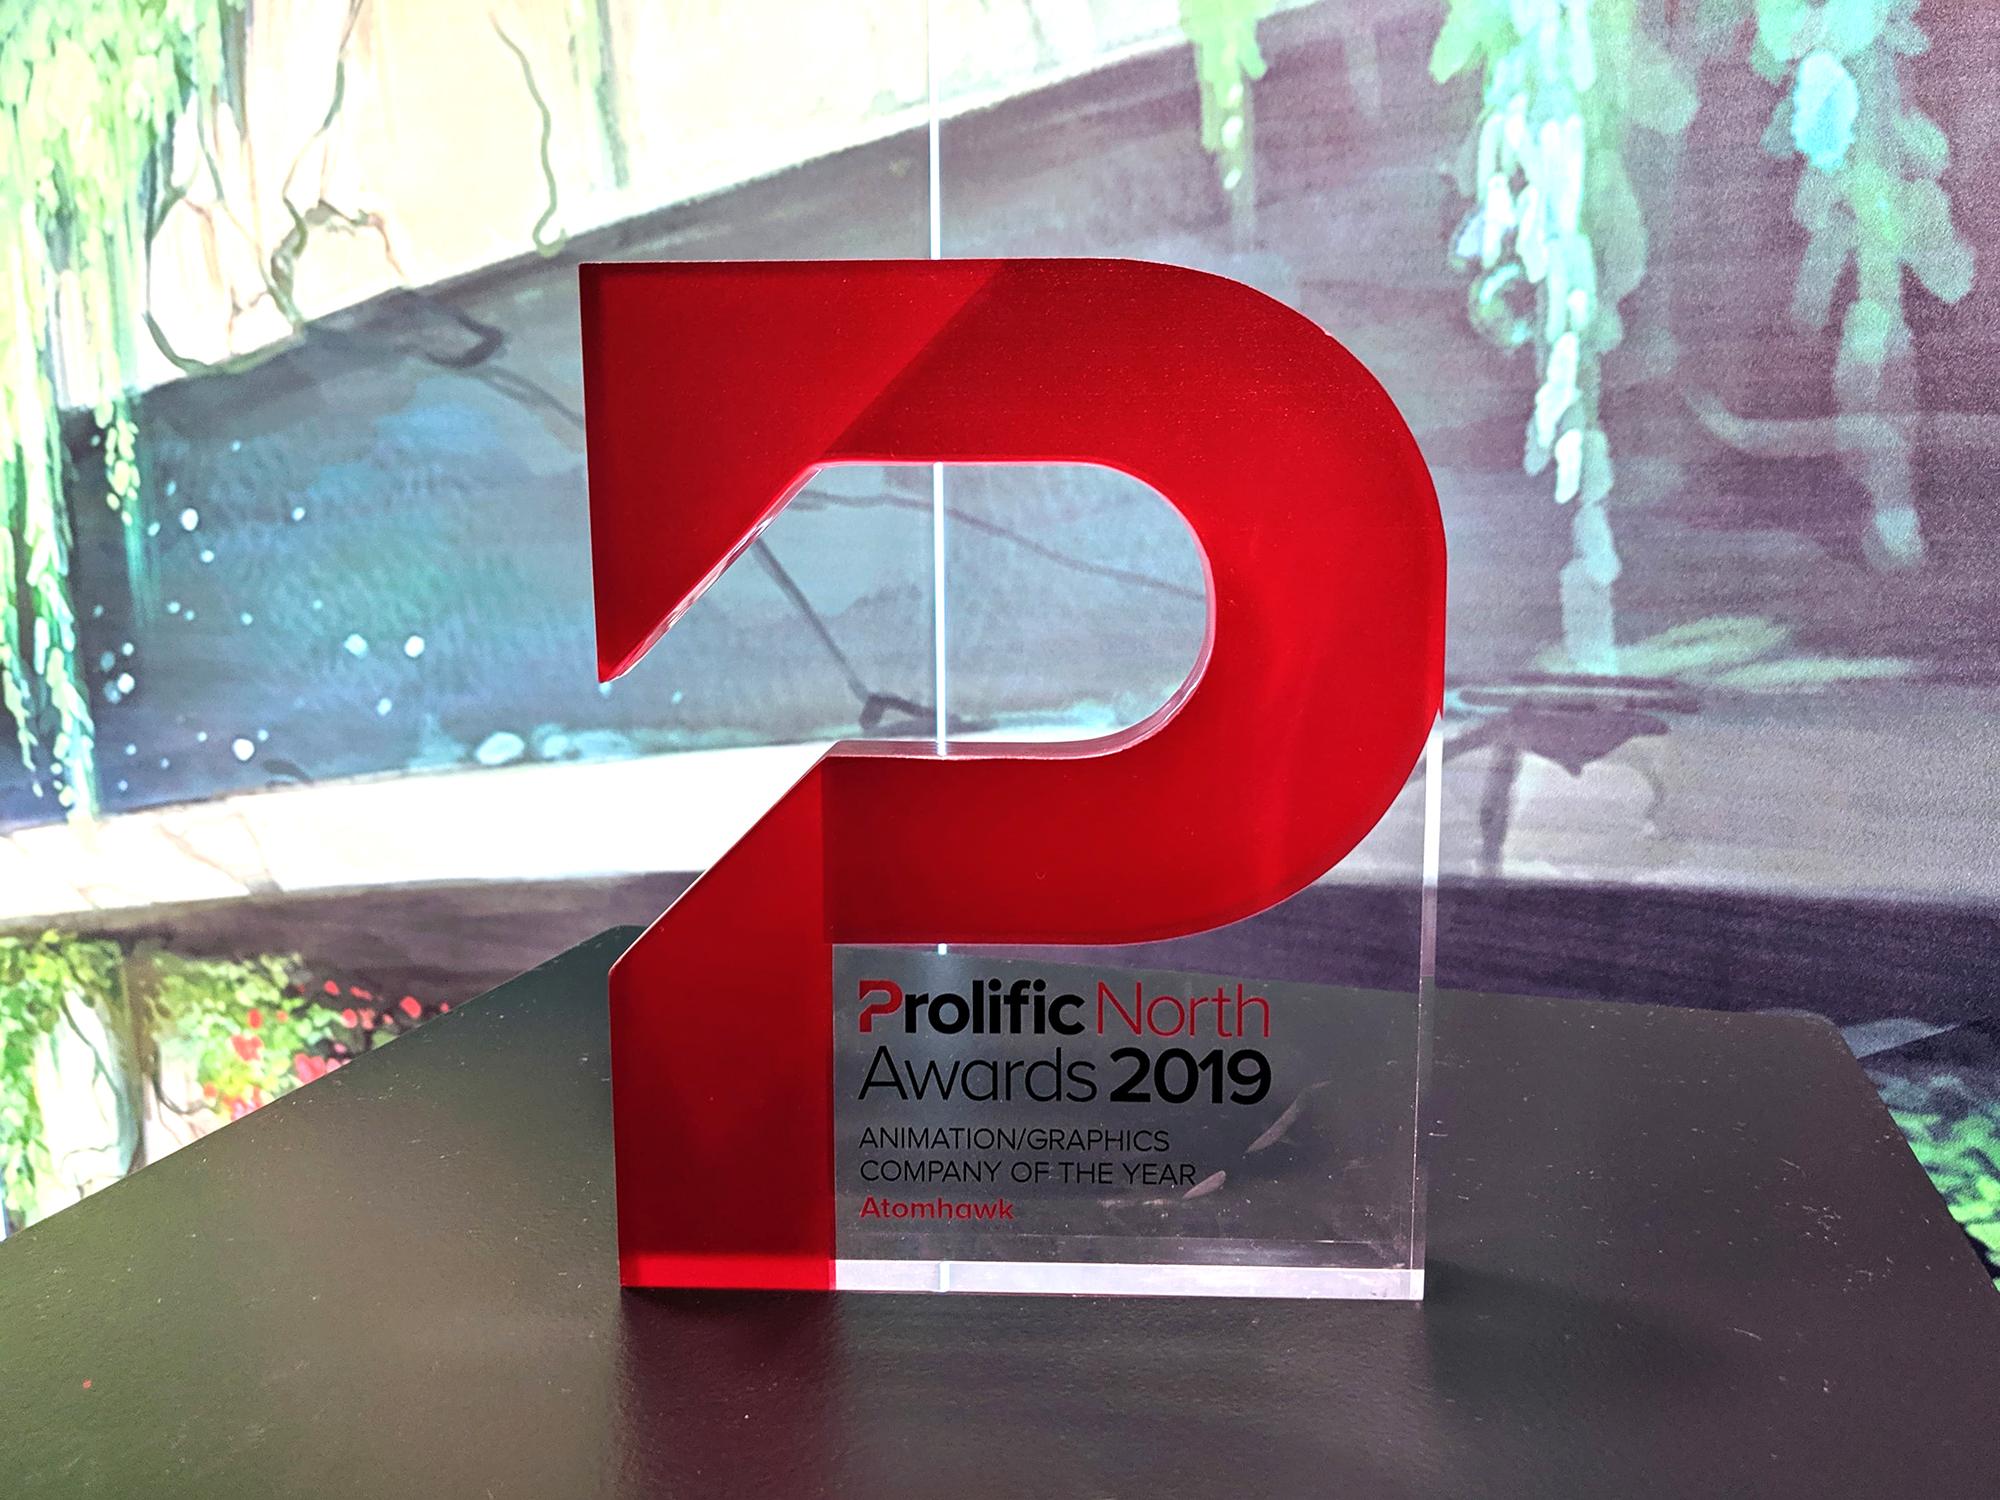 Atomhawk_Prolific_North_Awards_2019_02